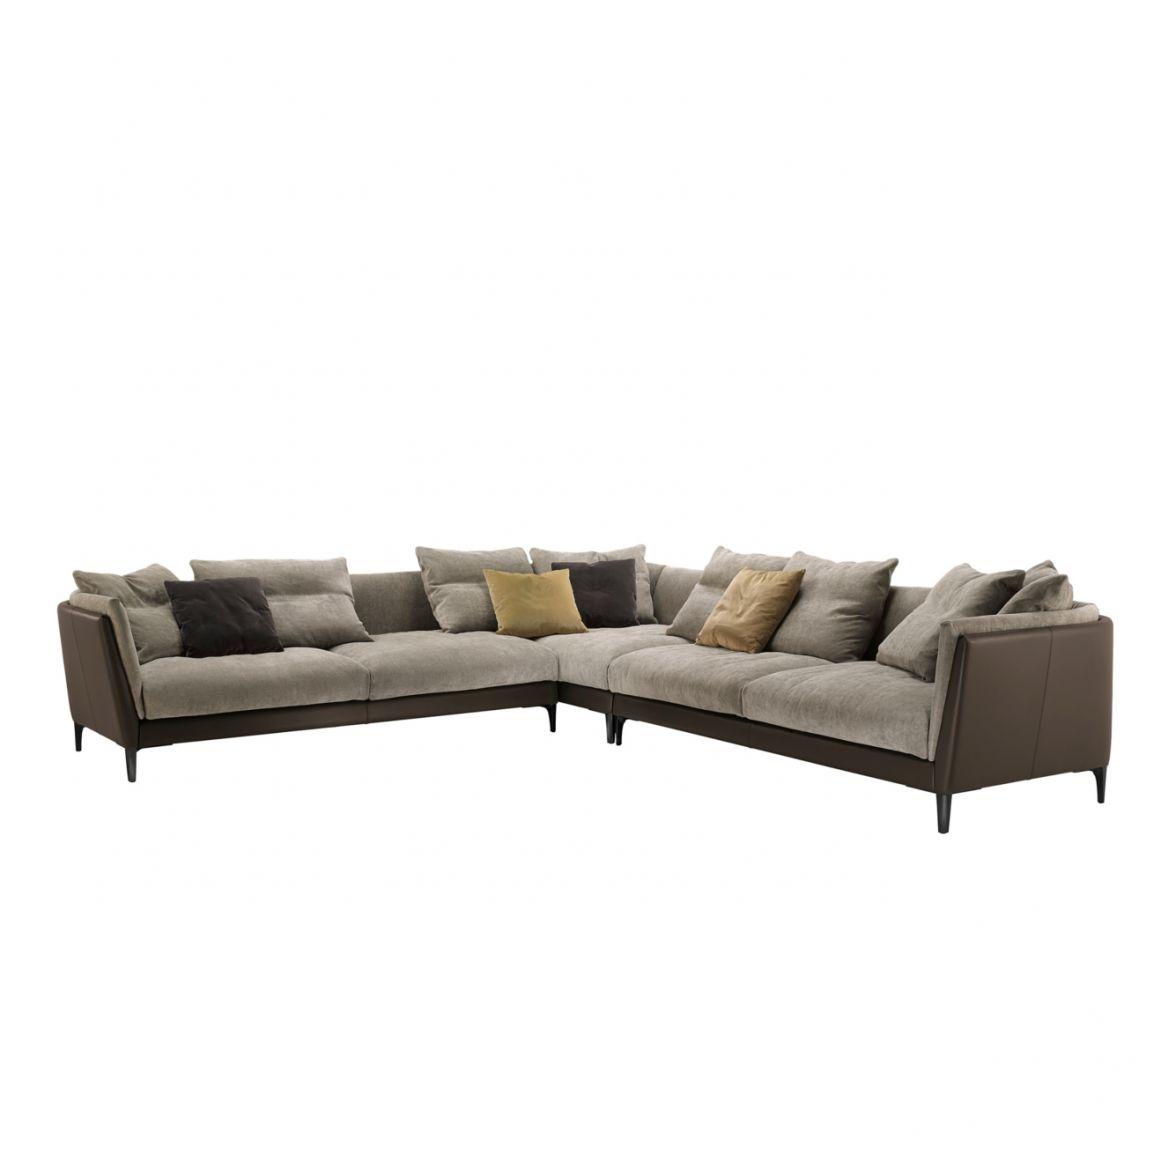 Bretagne sofa